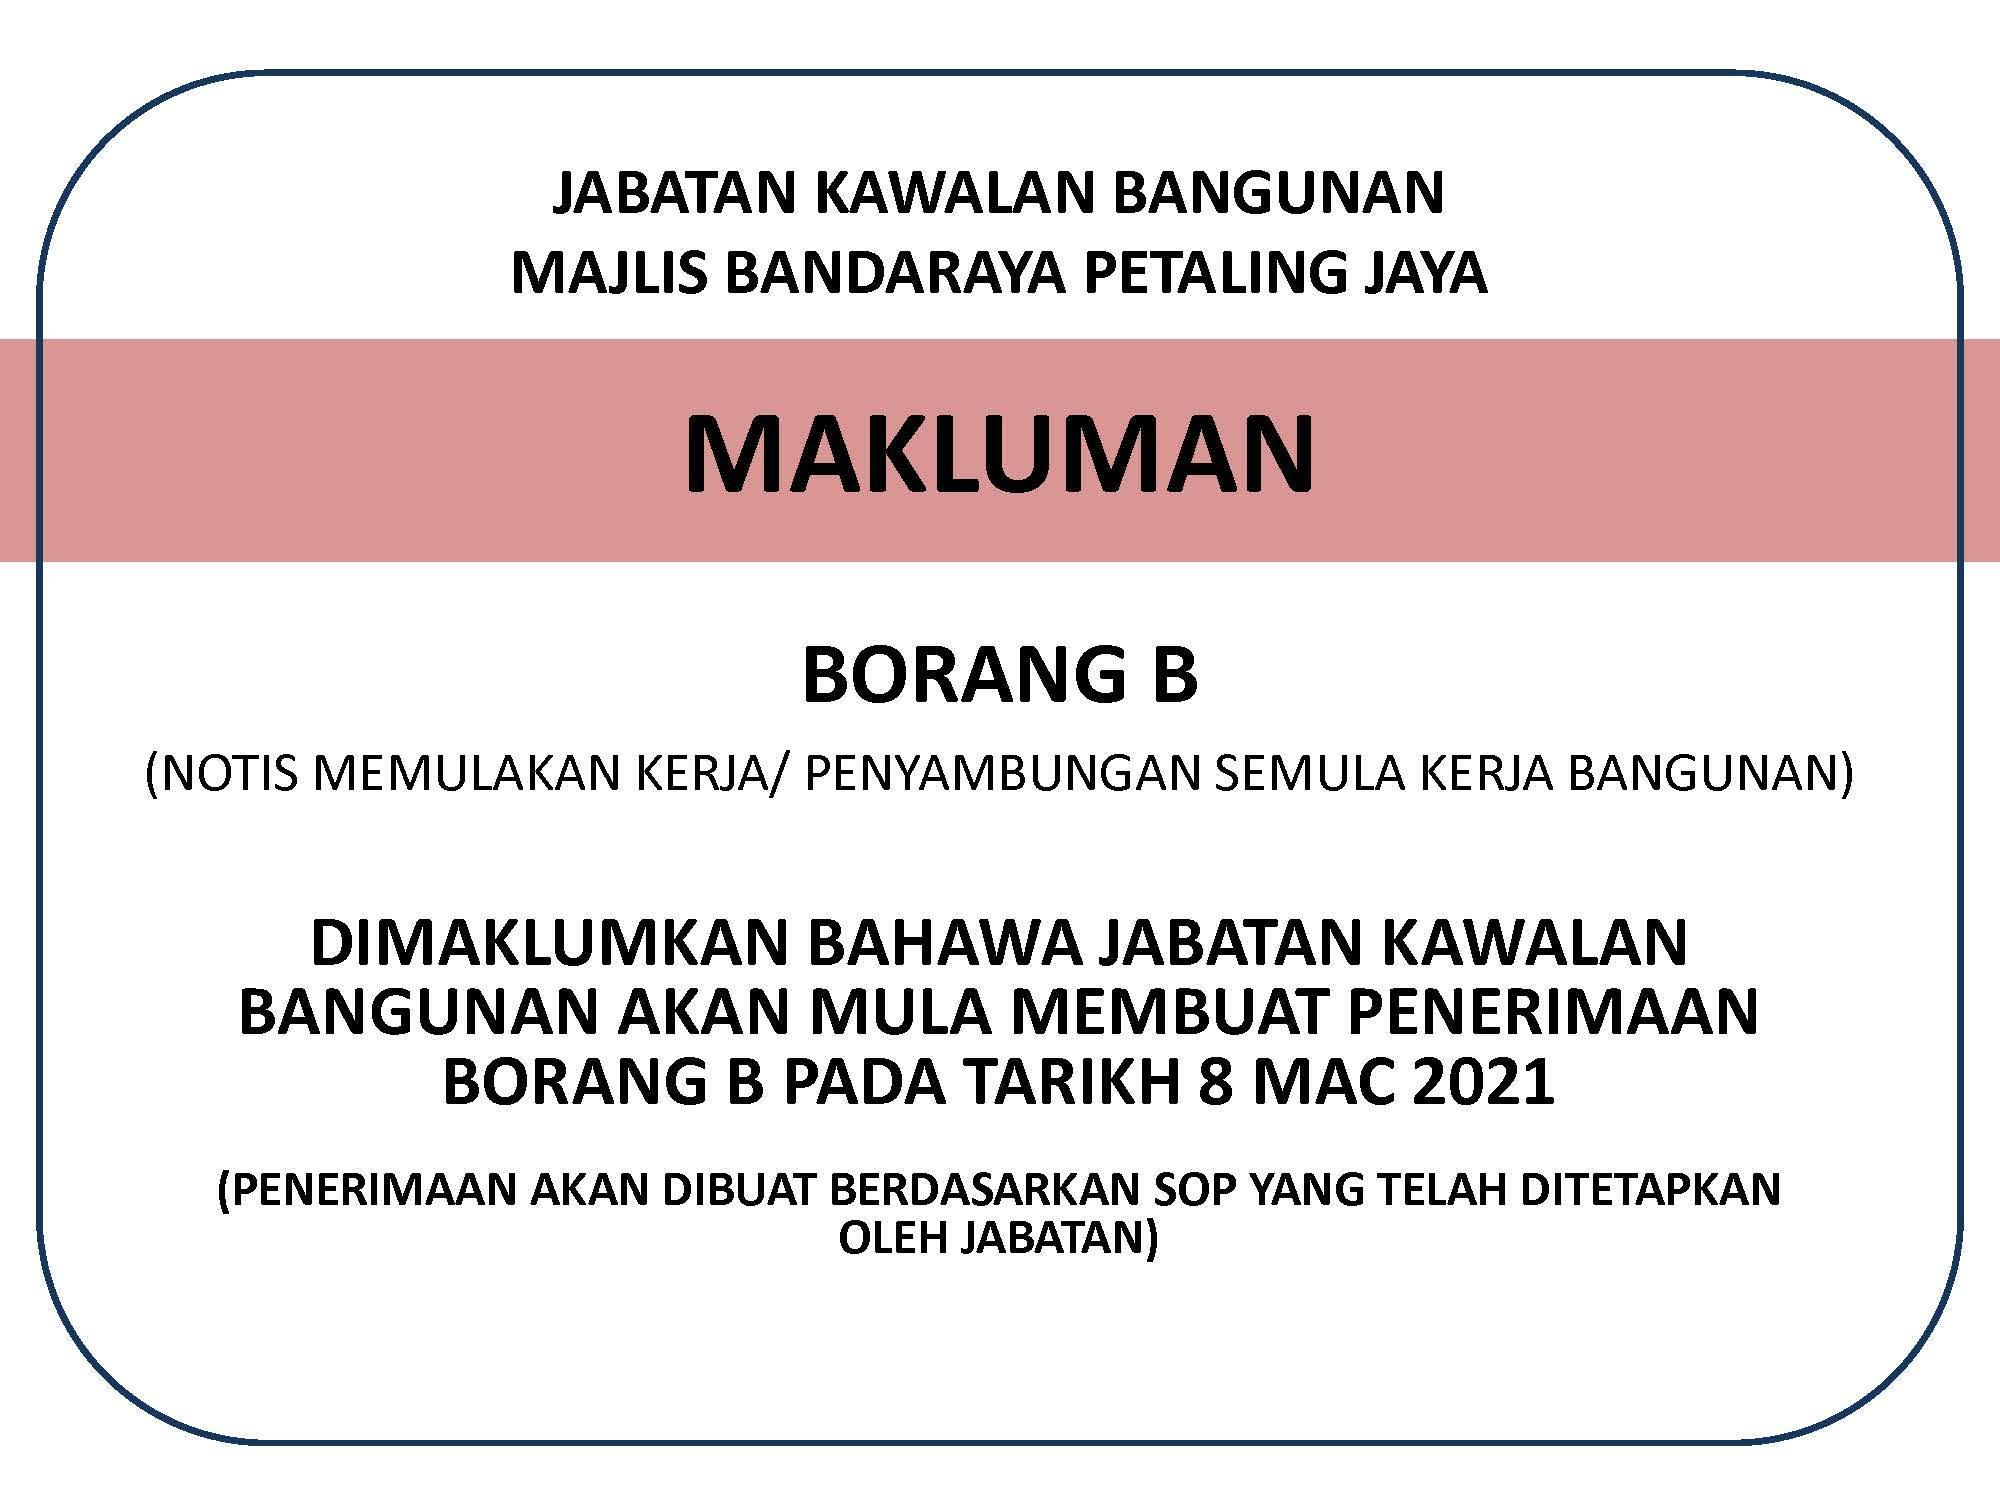 Makluman JKB 08032021